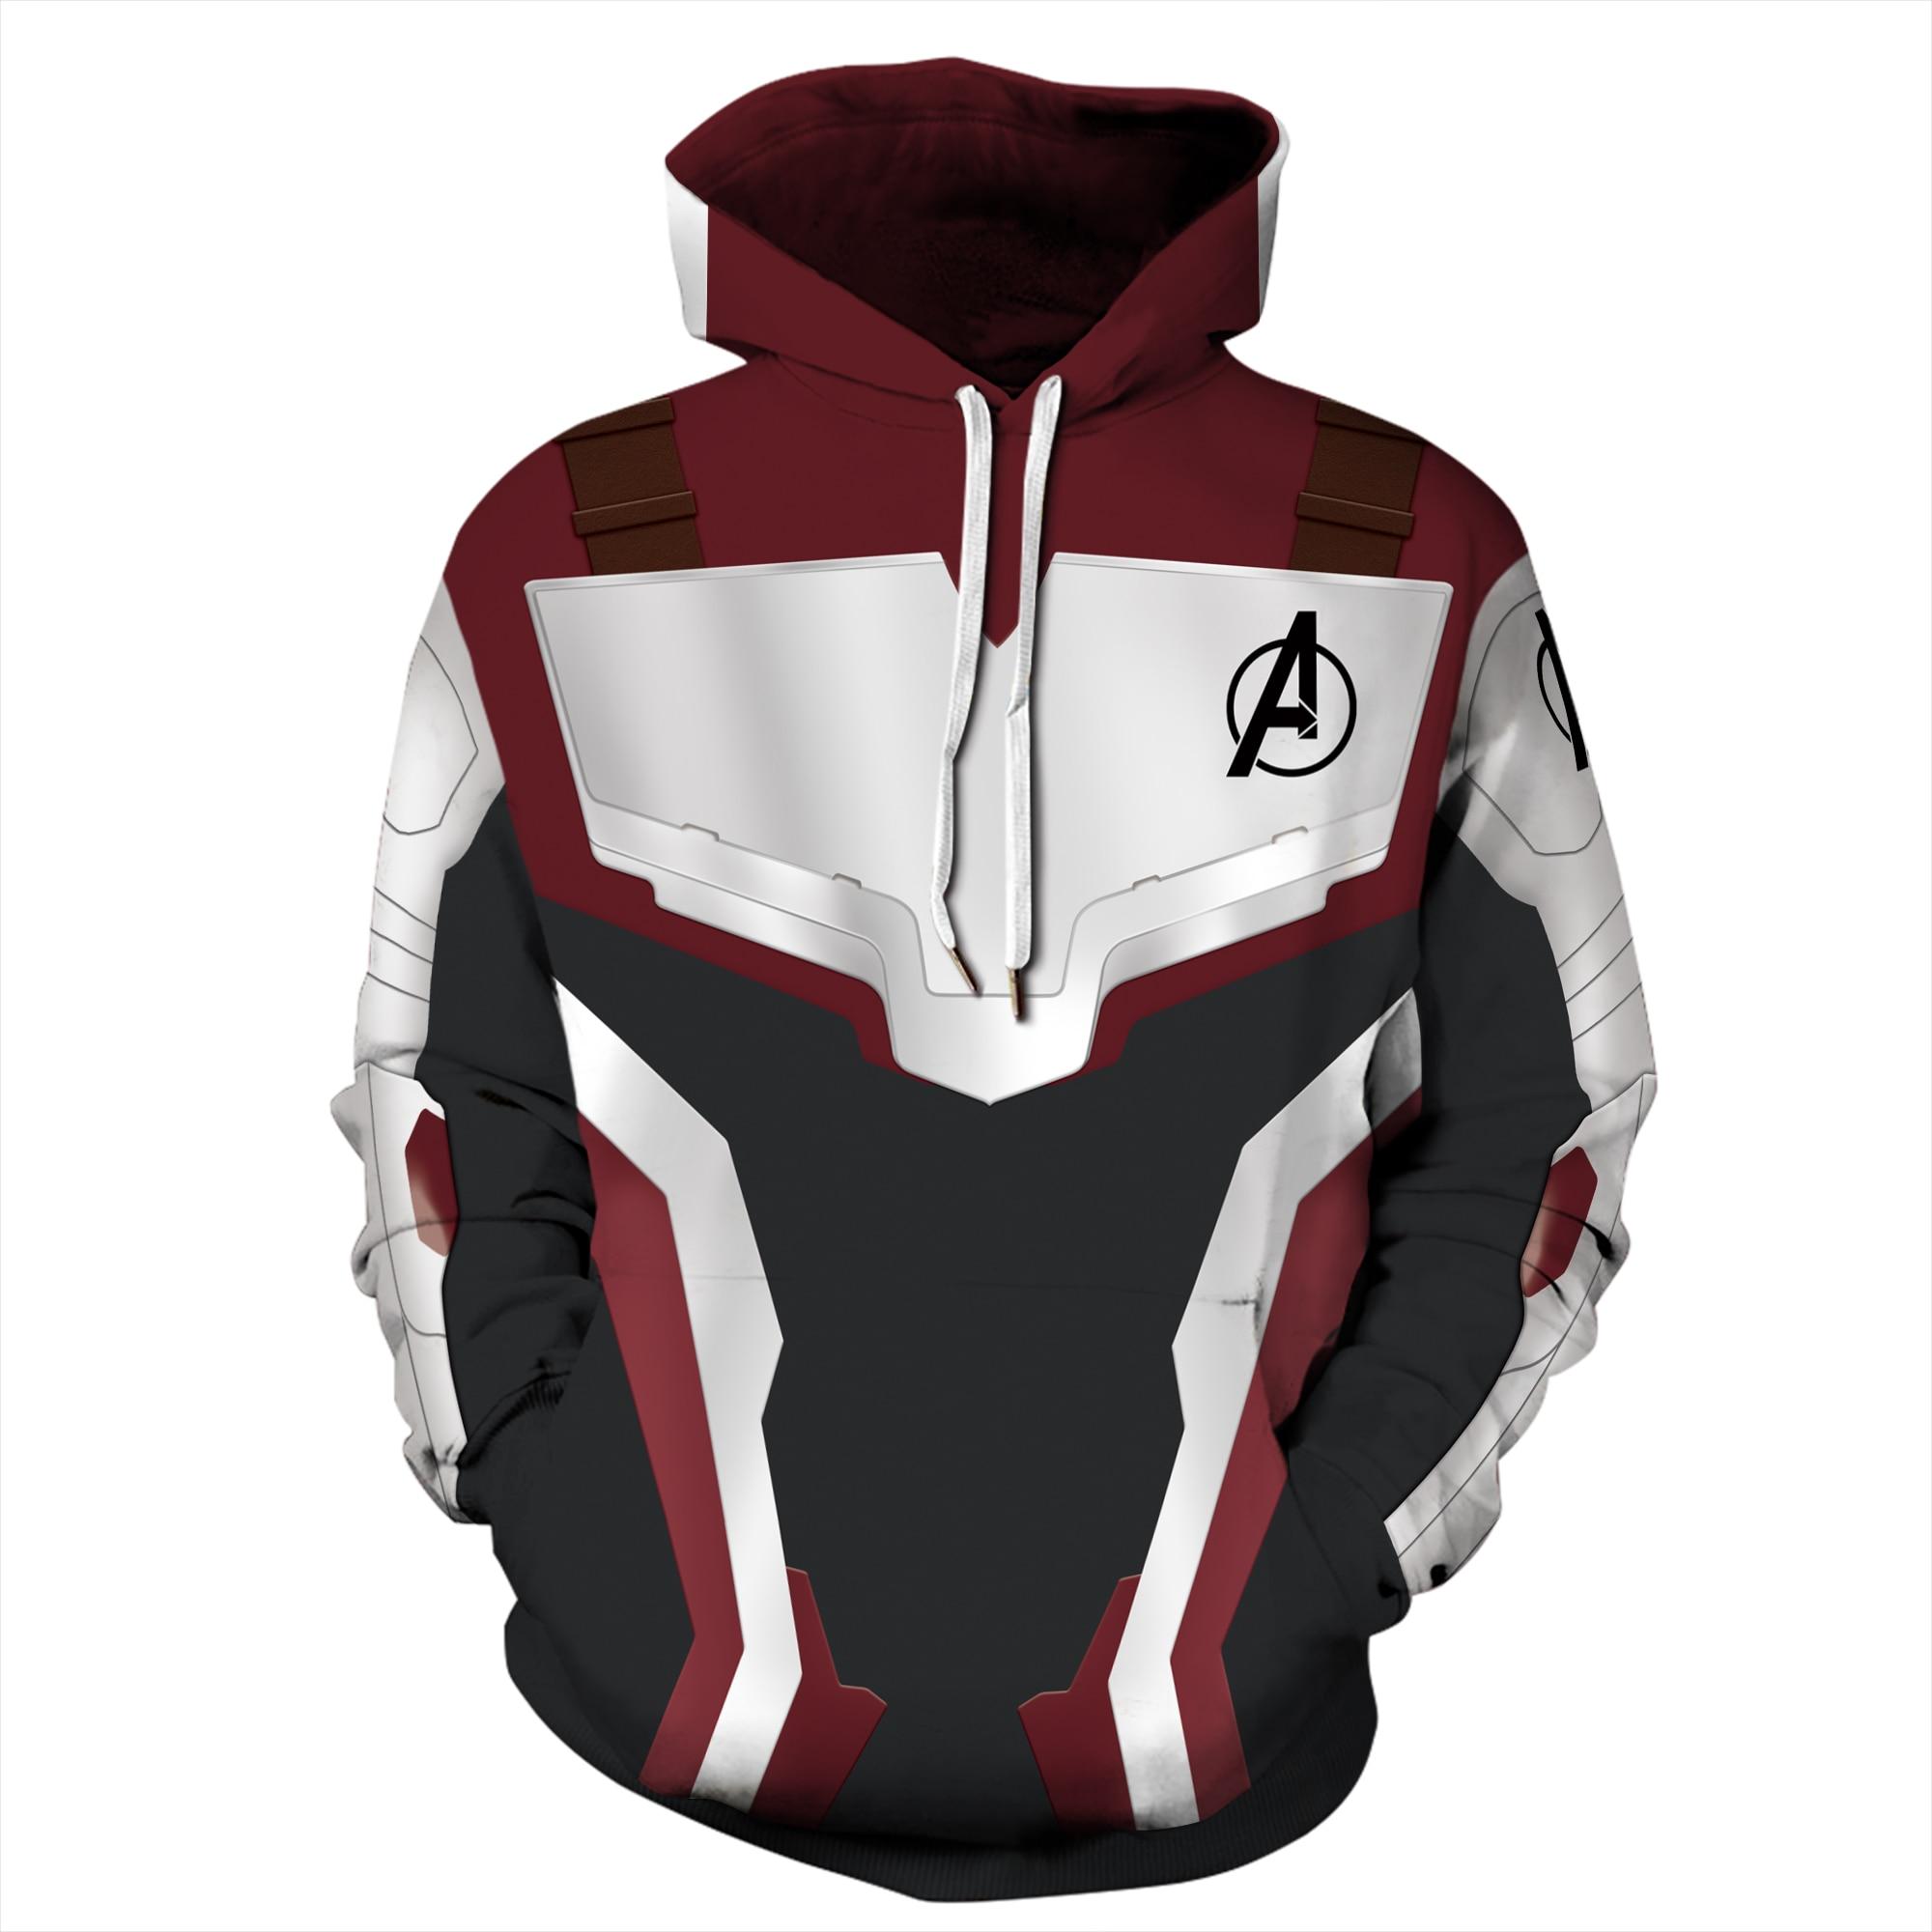 vip-fashion-new-design-sublimation-3d-printed-font-b-marvel-b-font-endgame-avengers-quantum-clothing-couple-hoodies-superhero-iron-zipper-hood